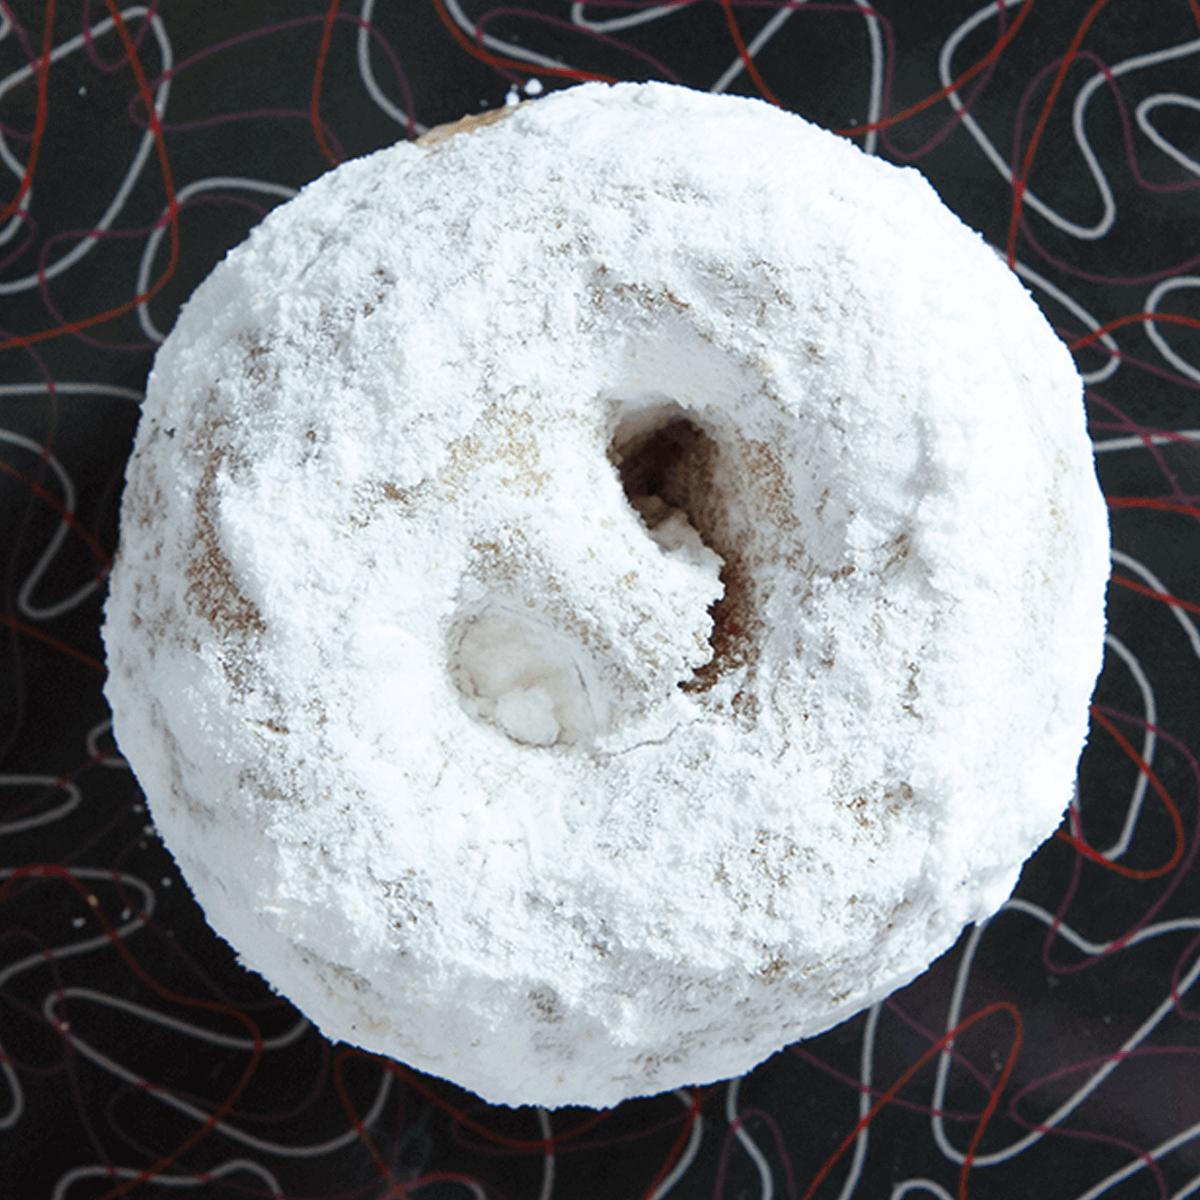 Big Pearl Sandy Pony Donuts